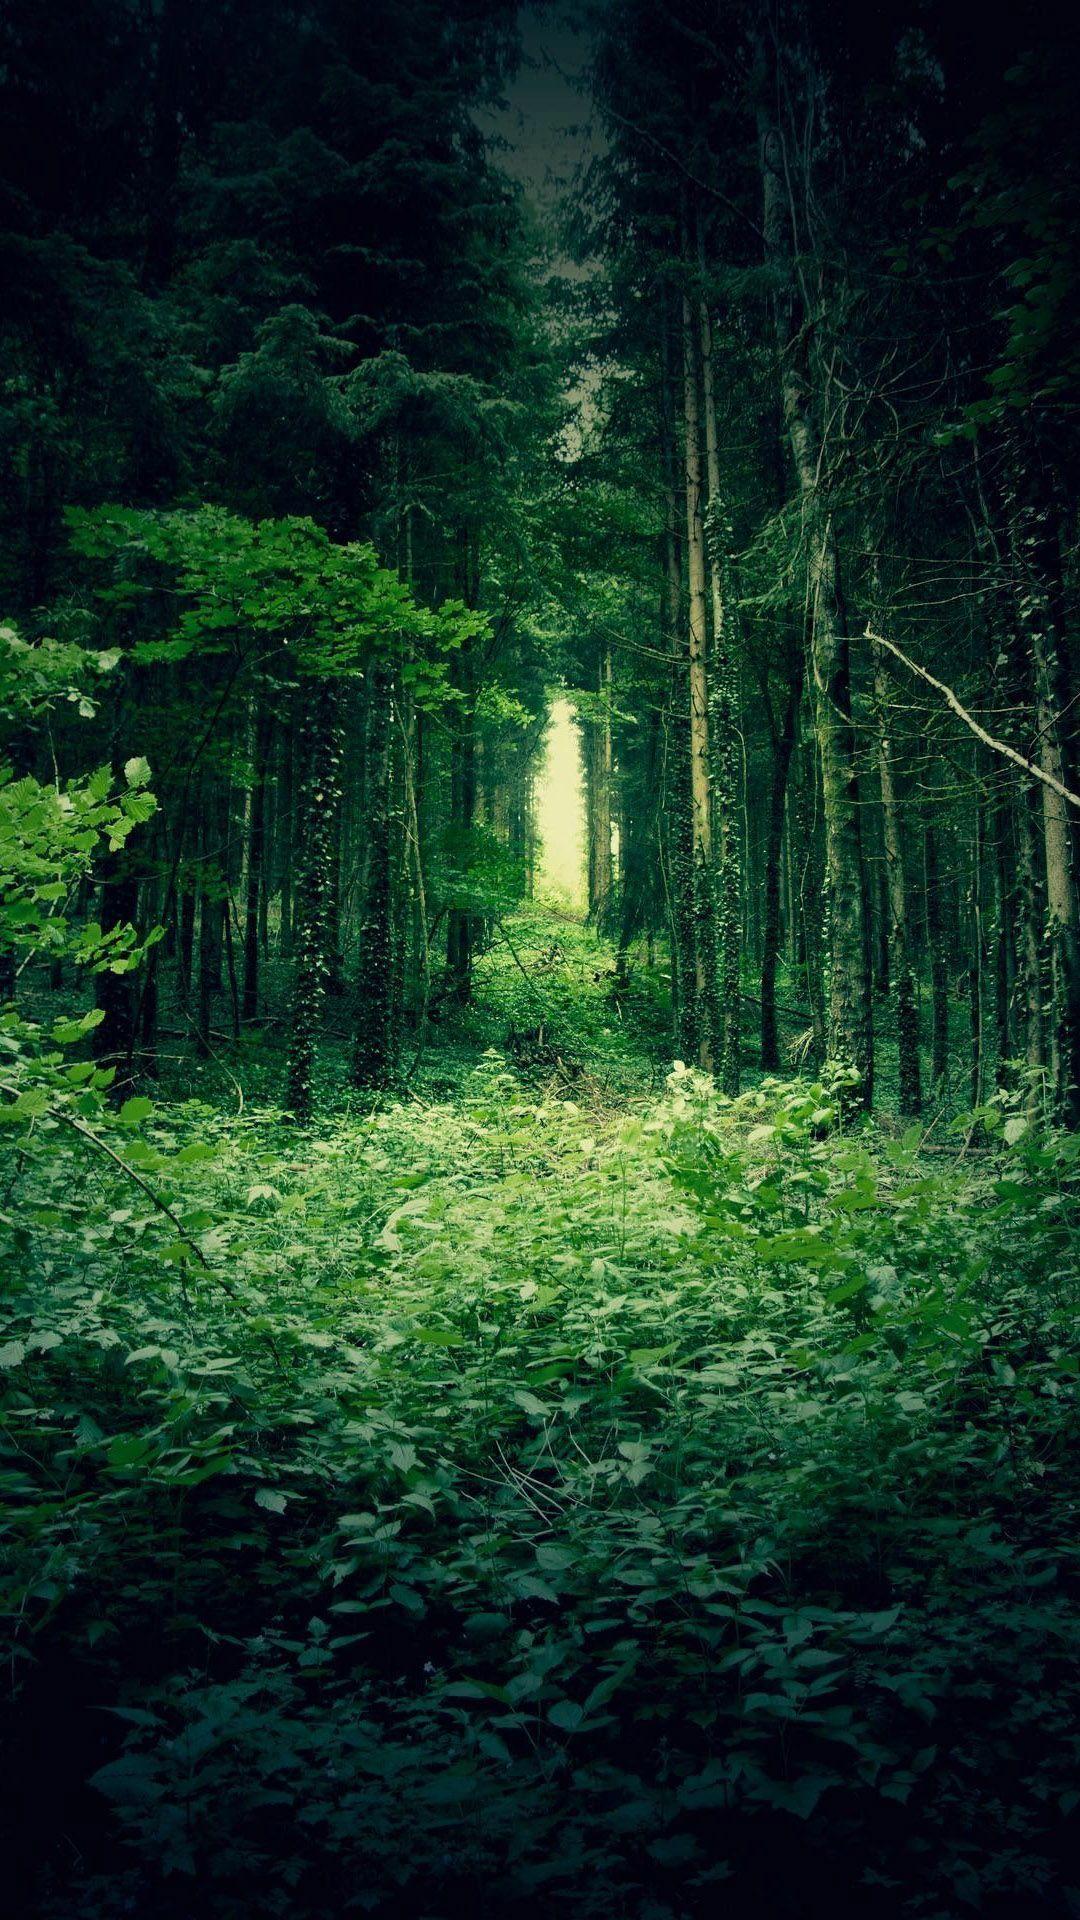 Green Forest Mobile Wallpaper Com Imagens Belas